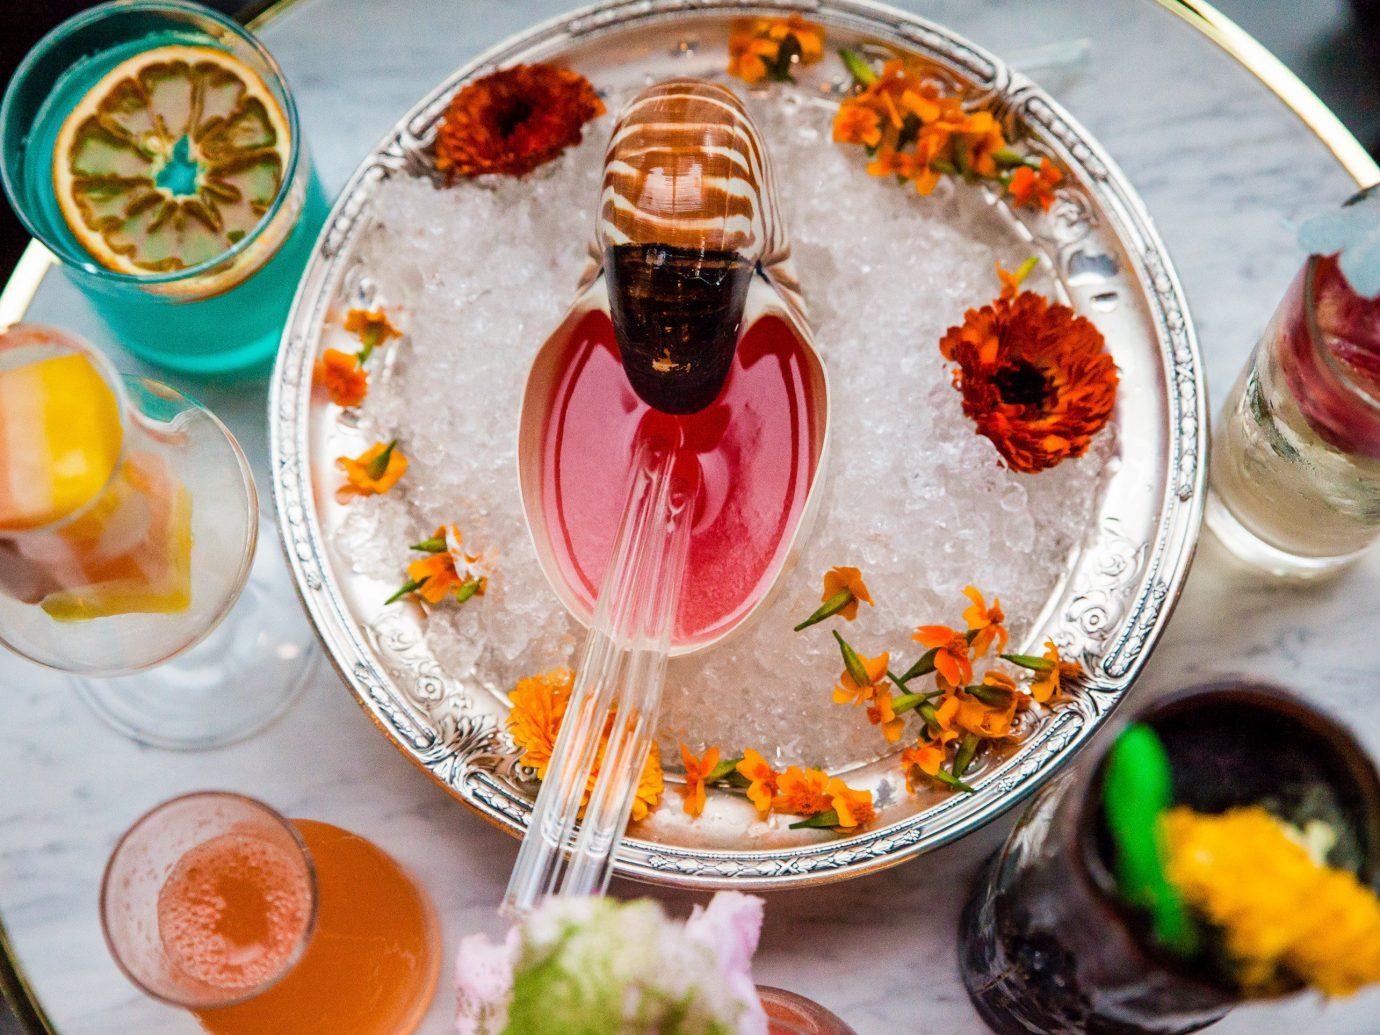 Arts + Culture Food + Drink Hotels Weekend Getaways food plate table dish meal brunch dessert cuisine breakfast several